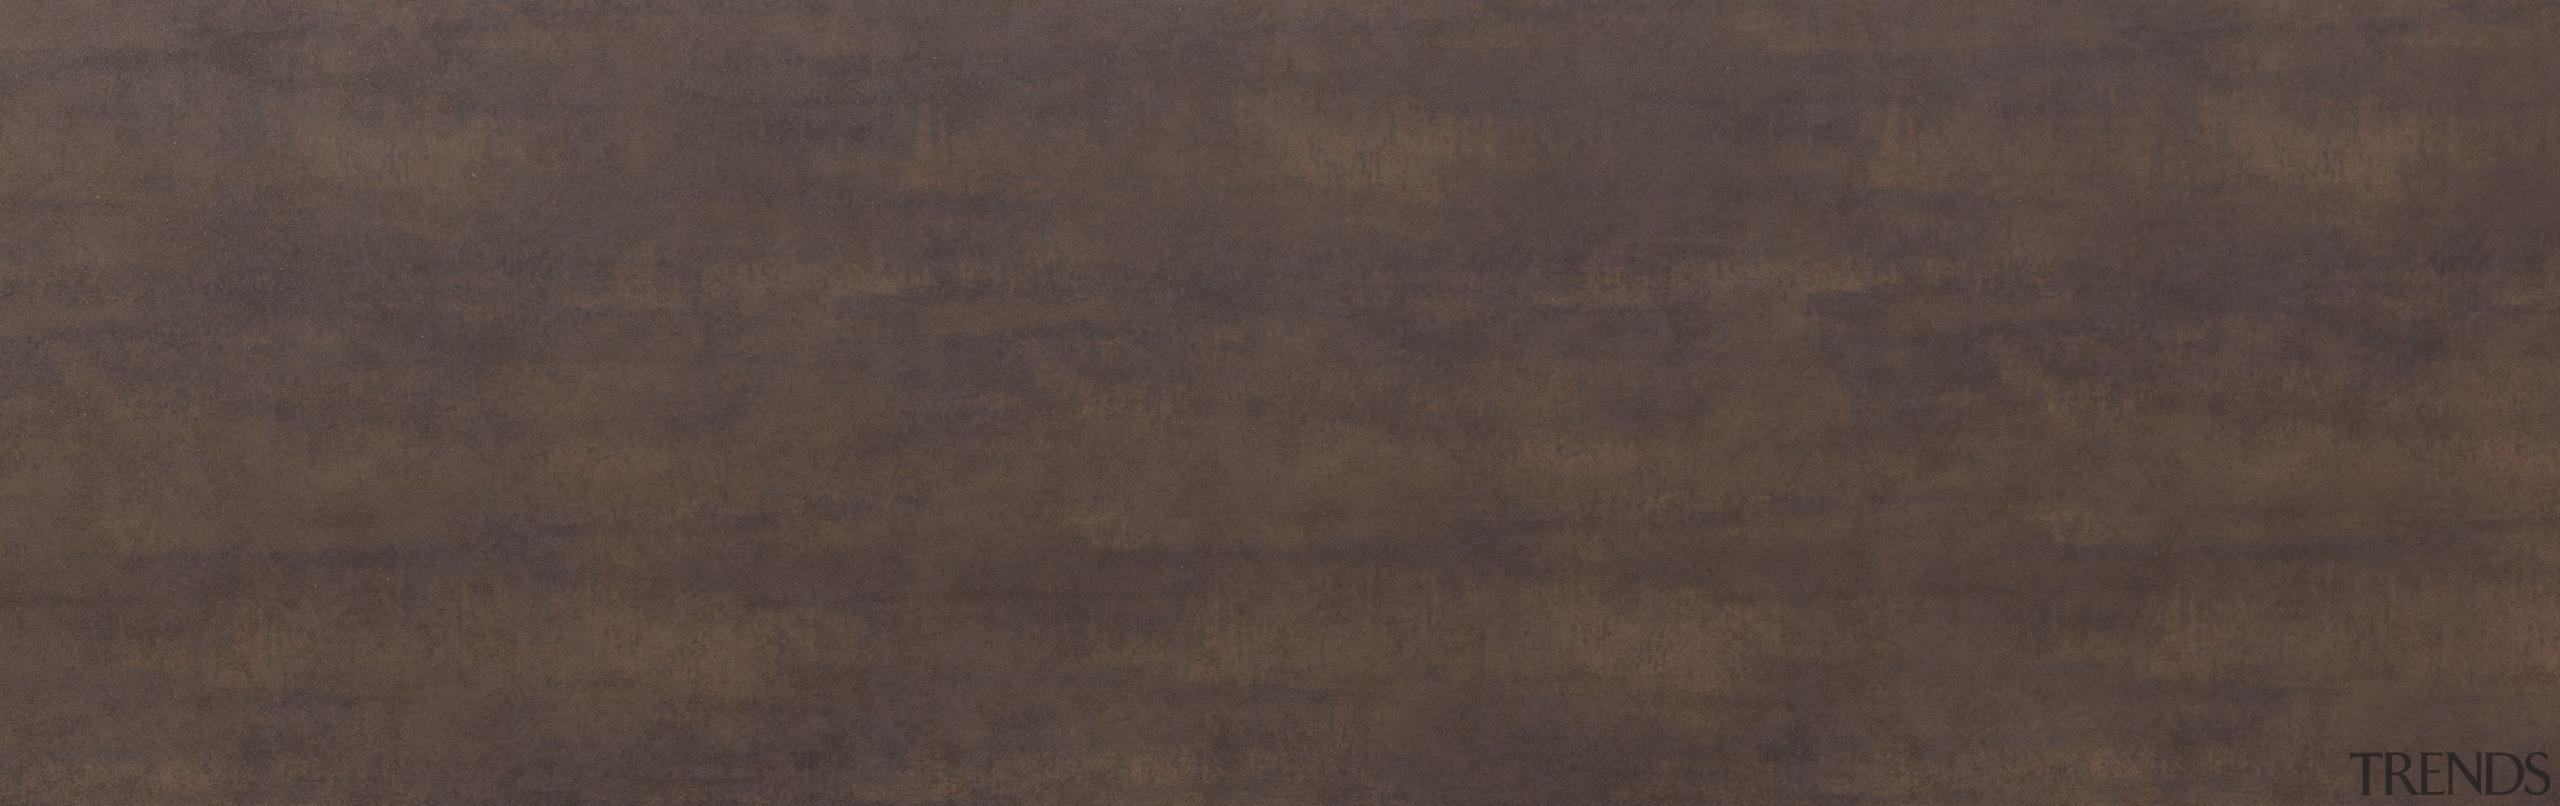 Iron Moss - brown | flooring | hardwood brown, flooring, hardwood, texture, wood, wood flooring, wood stain, gray, black